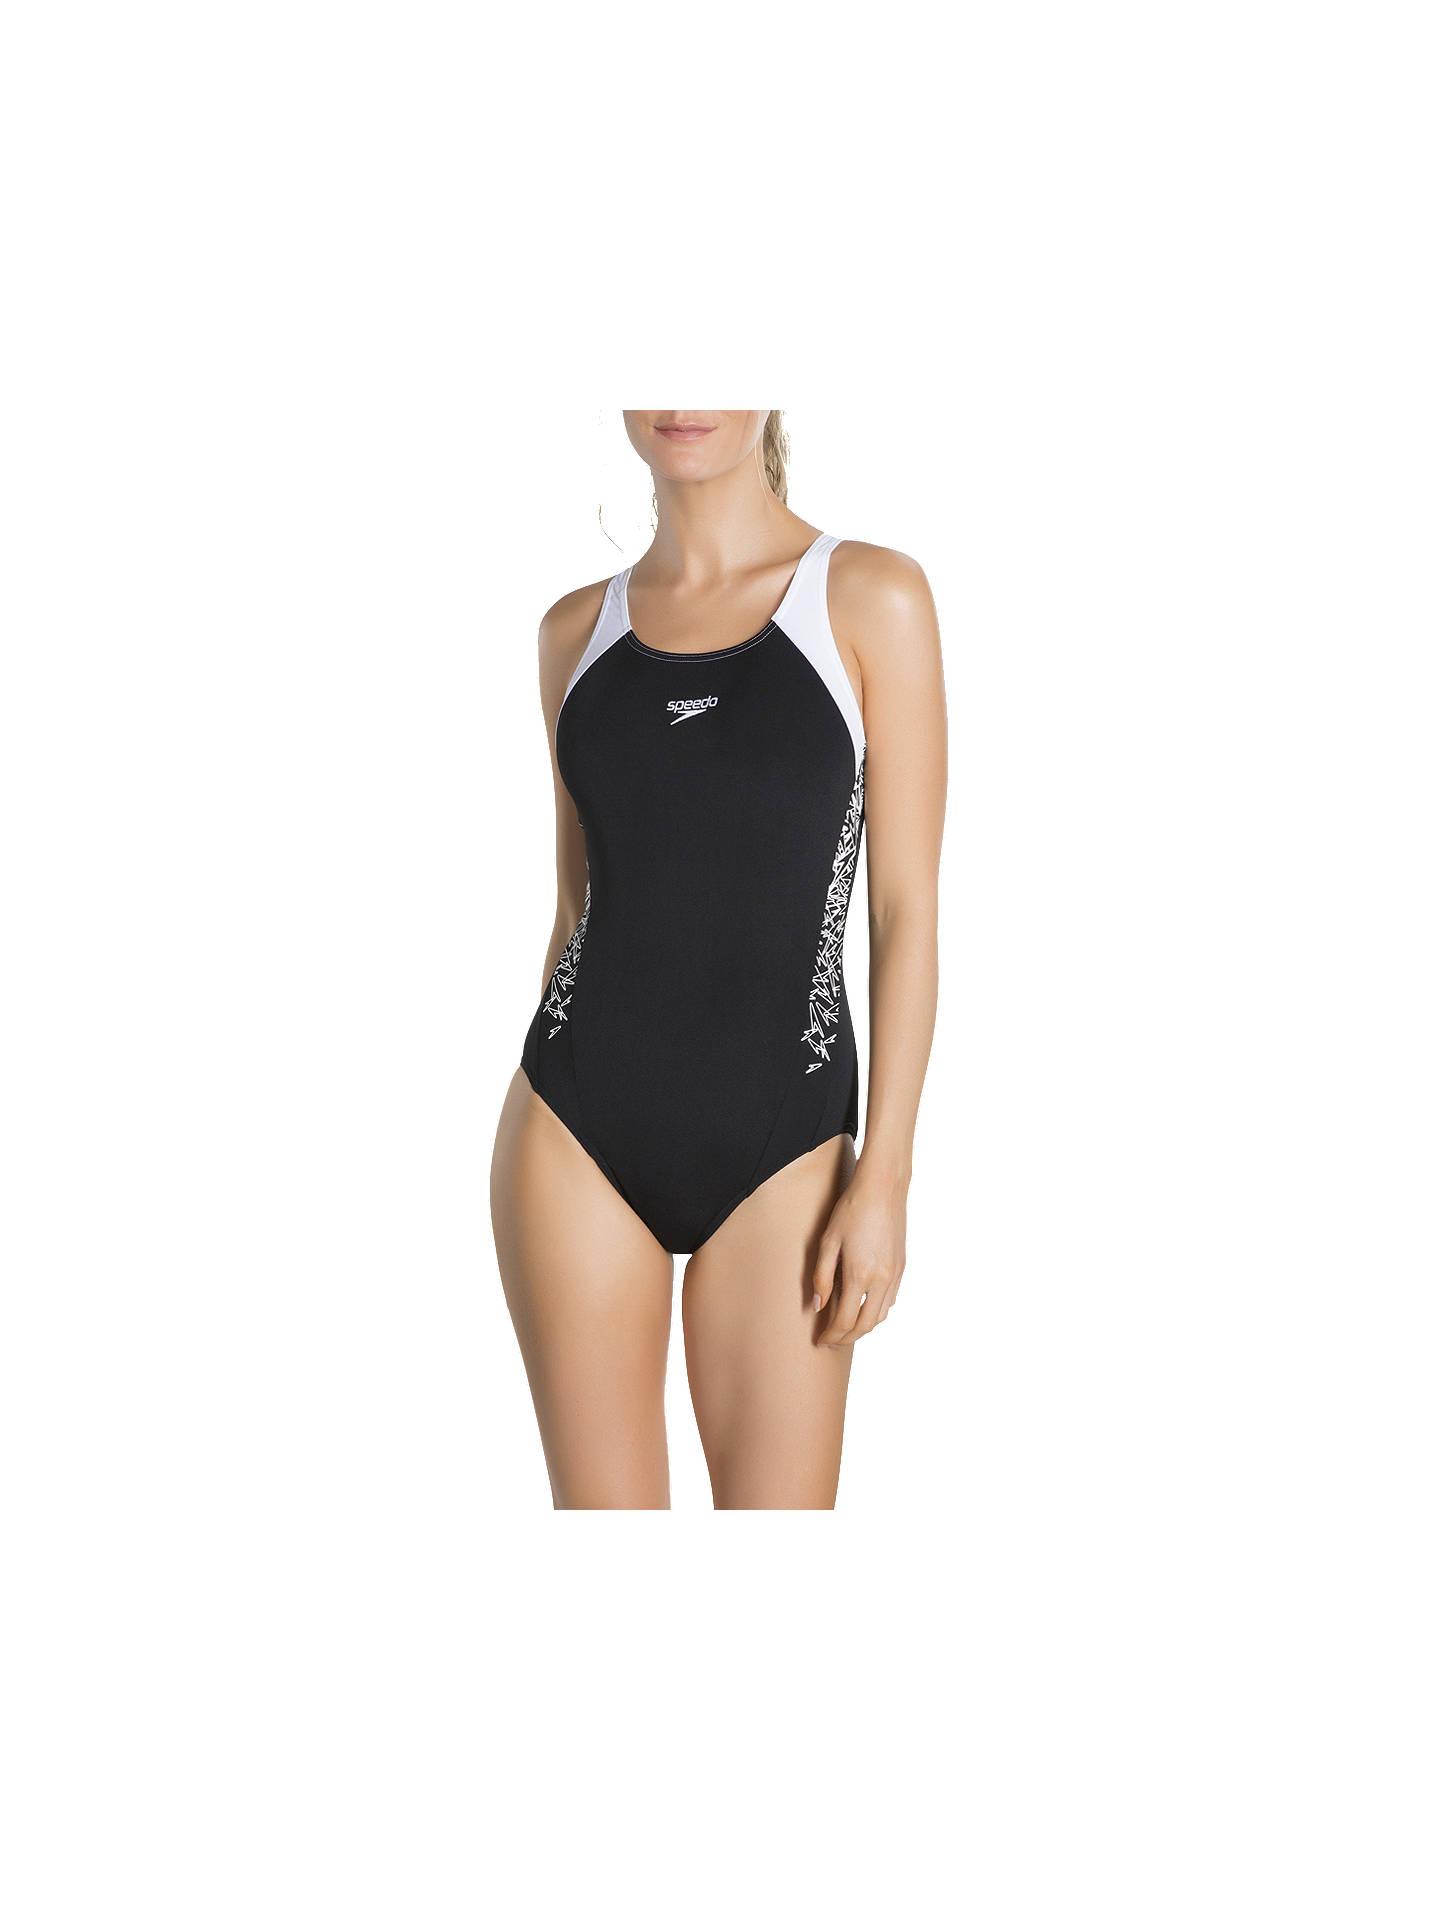 High Quality Buy Speedo Boom Splice Muscleback Swimsuit, Black/White, 32 Online At  Johnlewis.